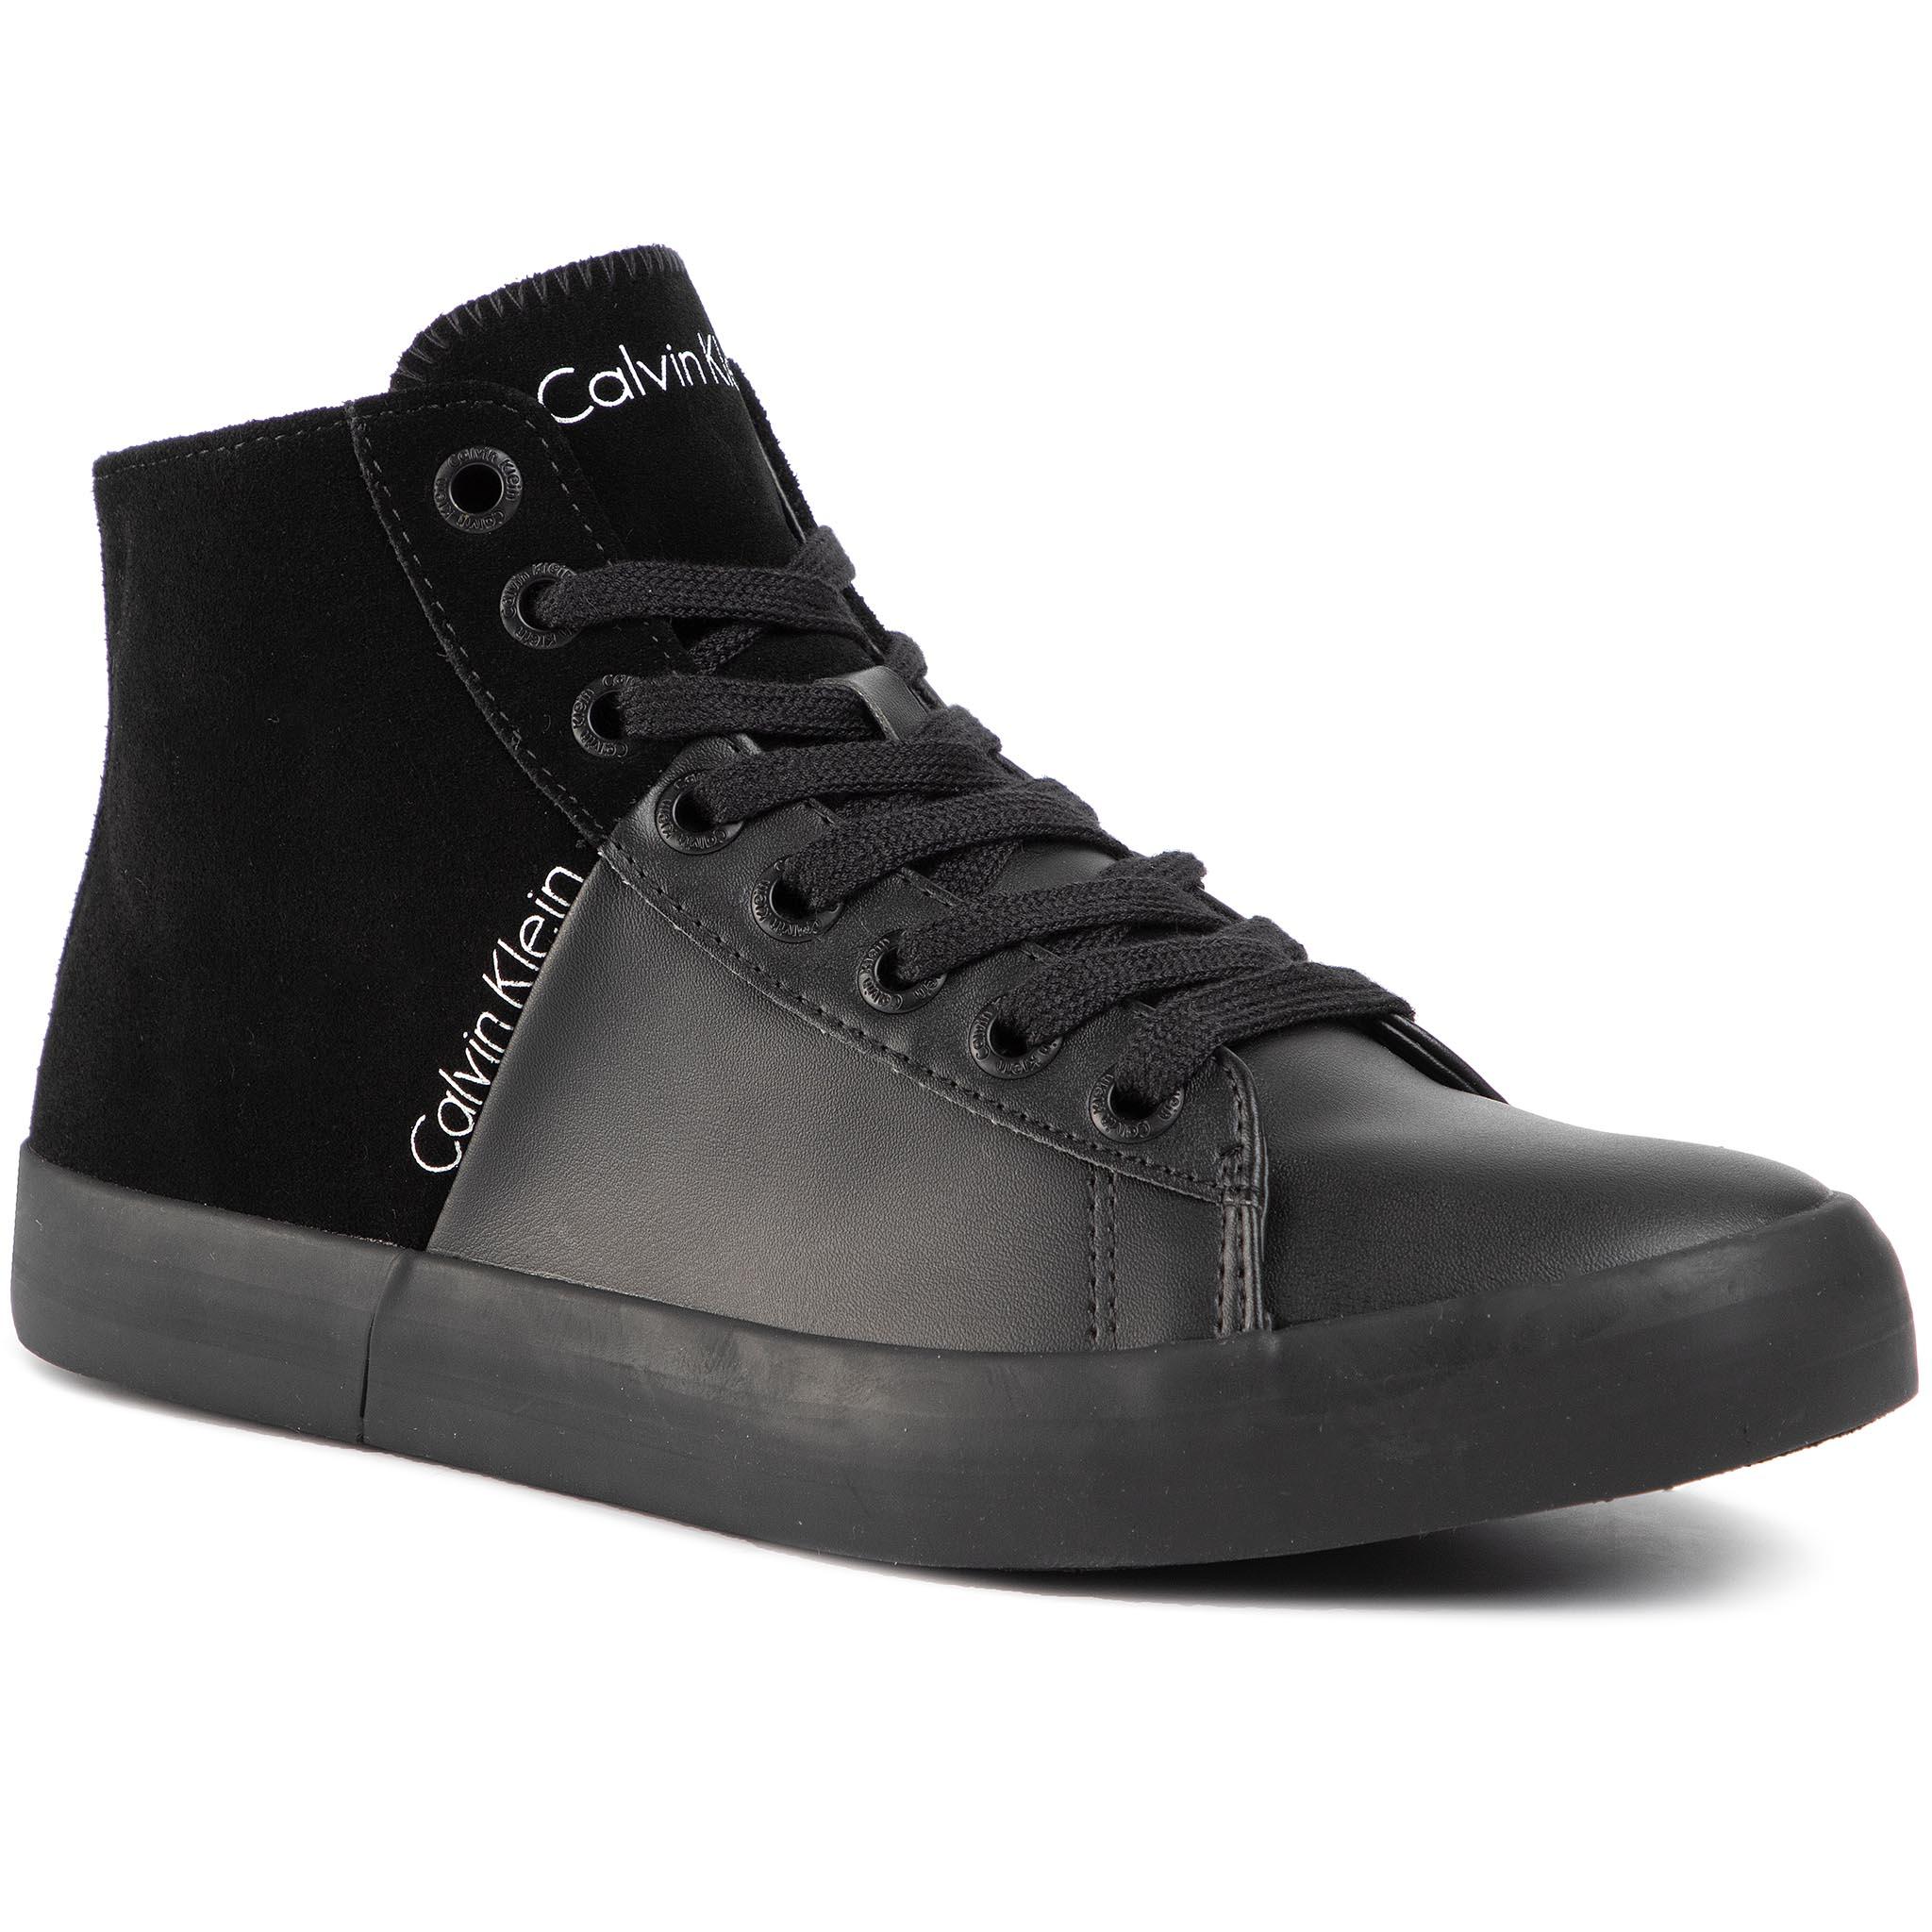 Image of Sneakers CALVIN KLEIN JEANS - Buck SE8463 Black/Black